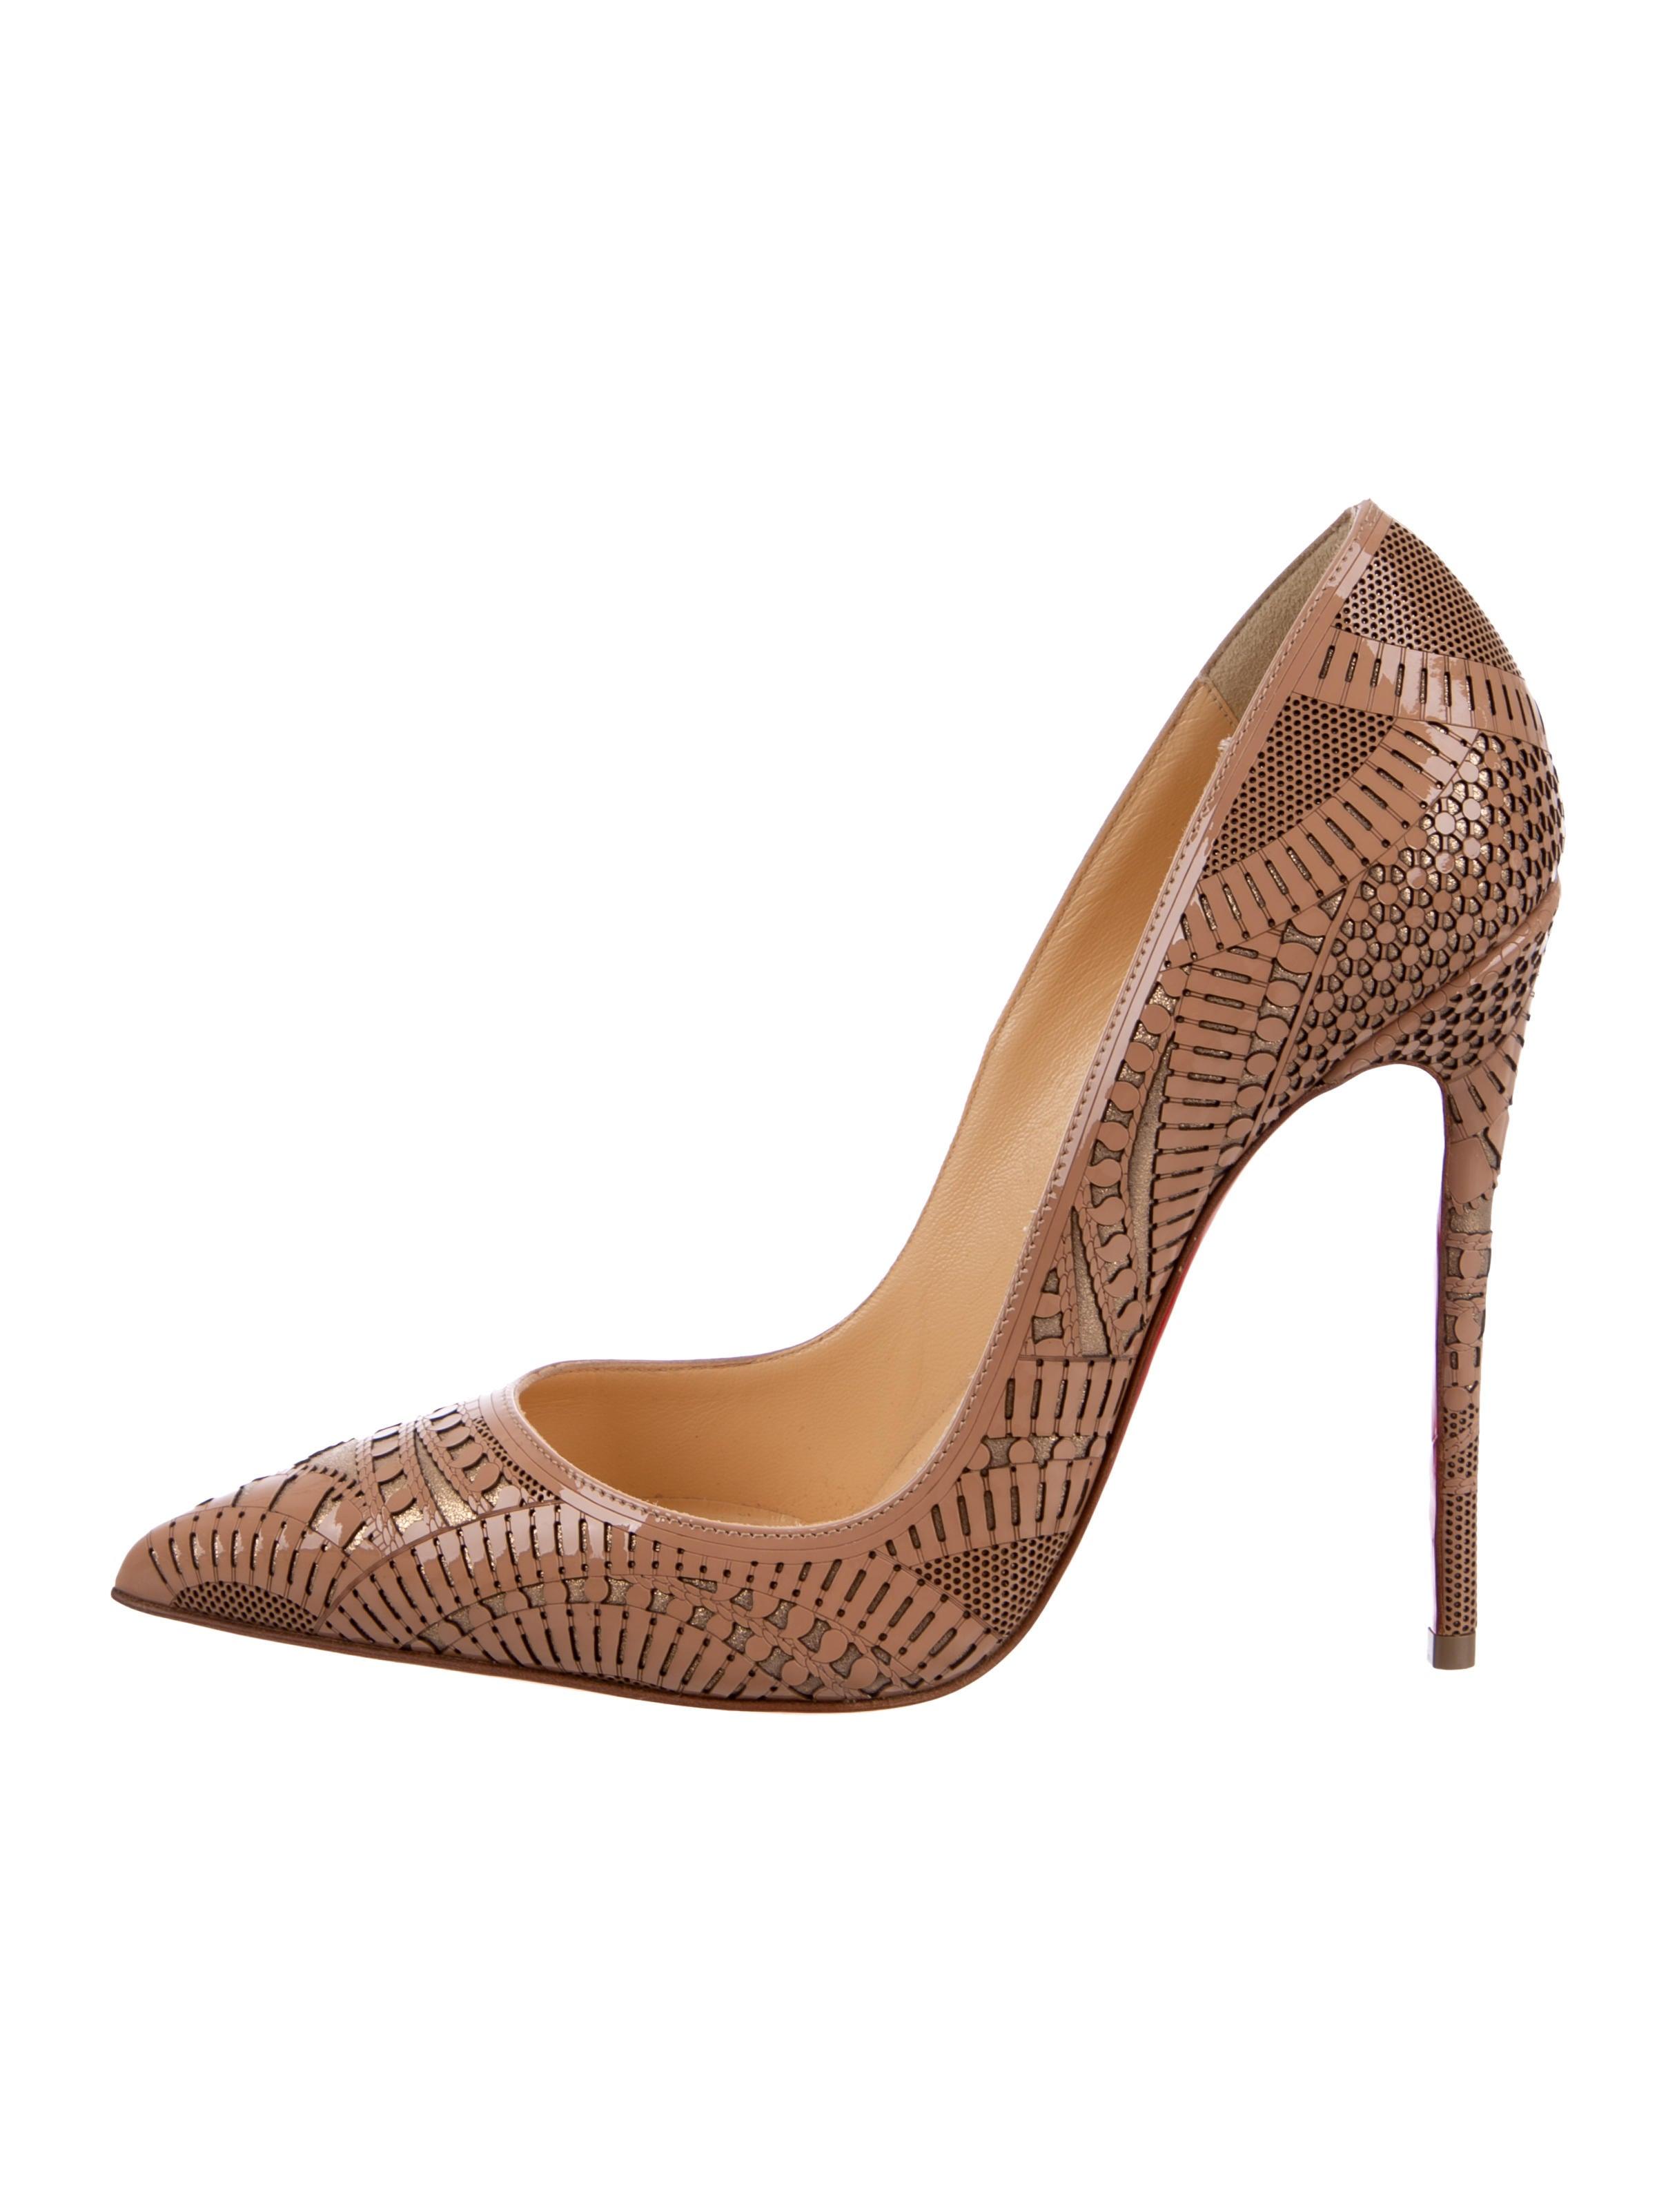 f4ab8a42e20b Christian Louboutin Kristali 120 Patent Leather Pumps - Shoes ...